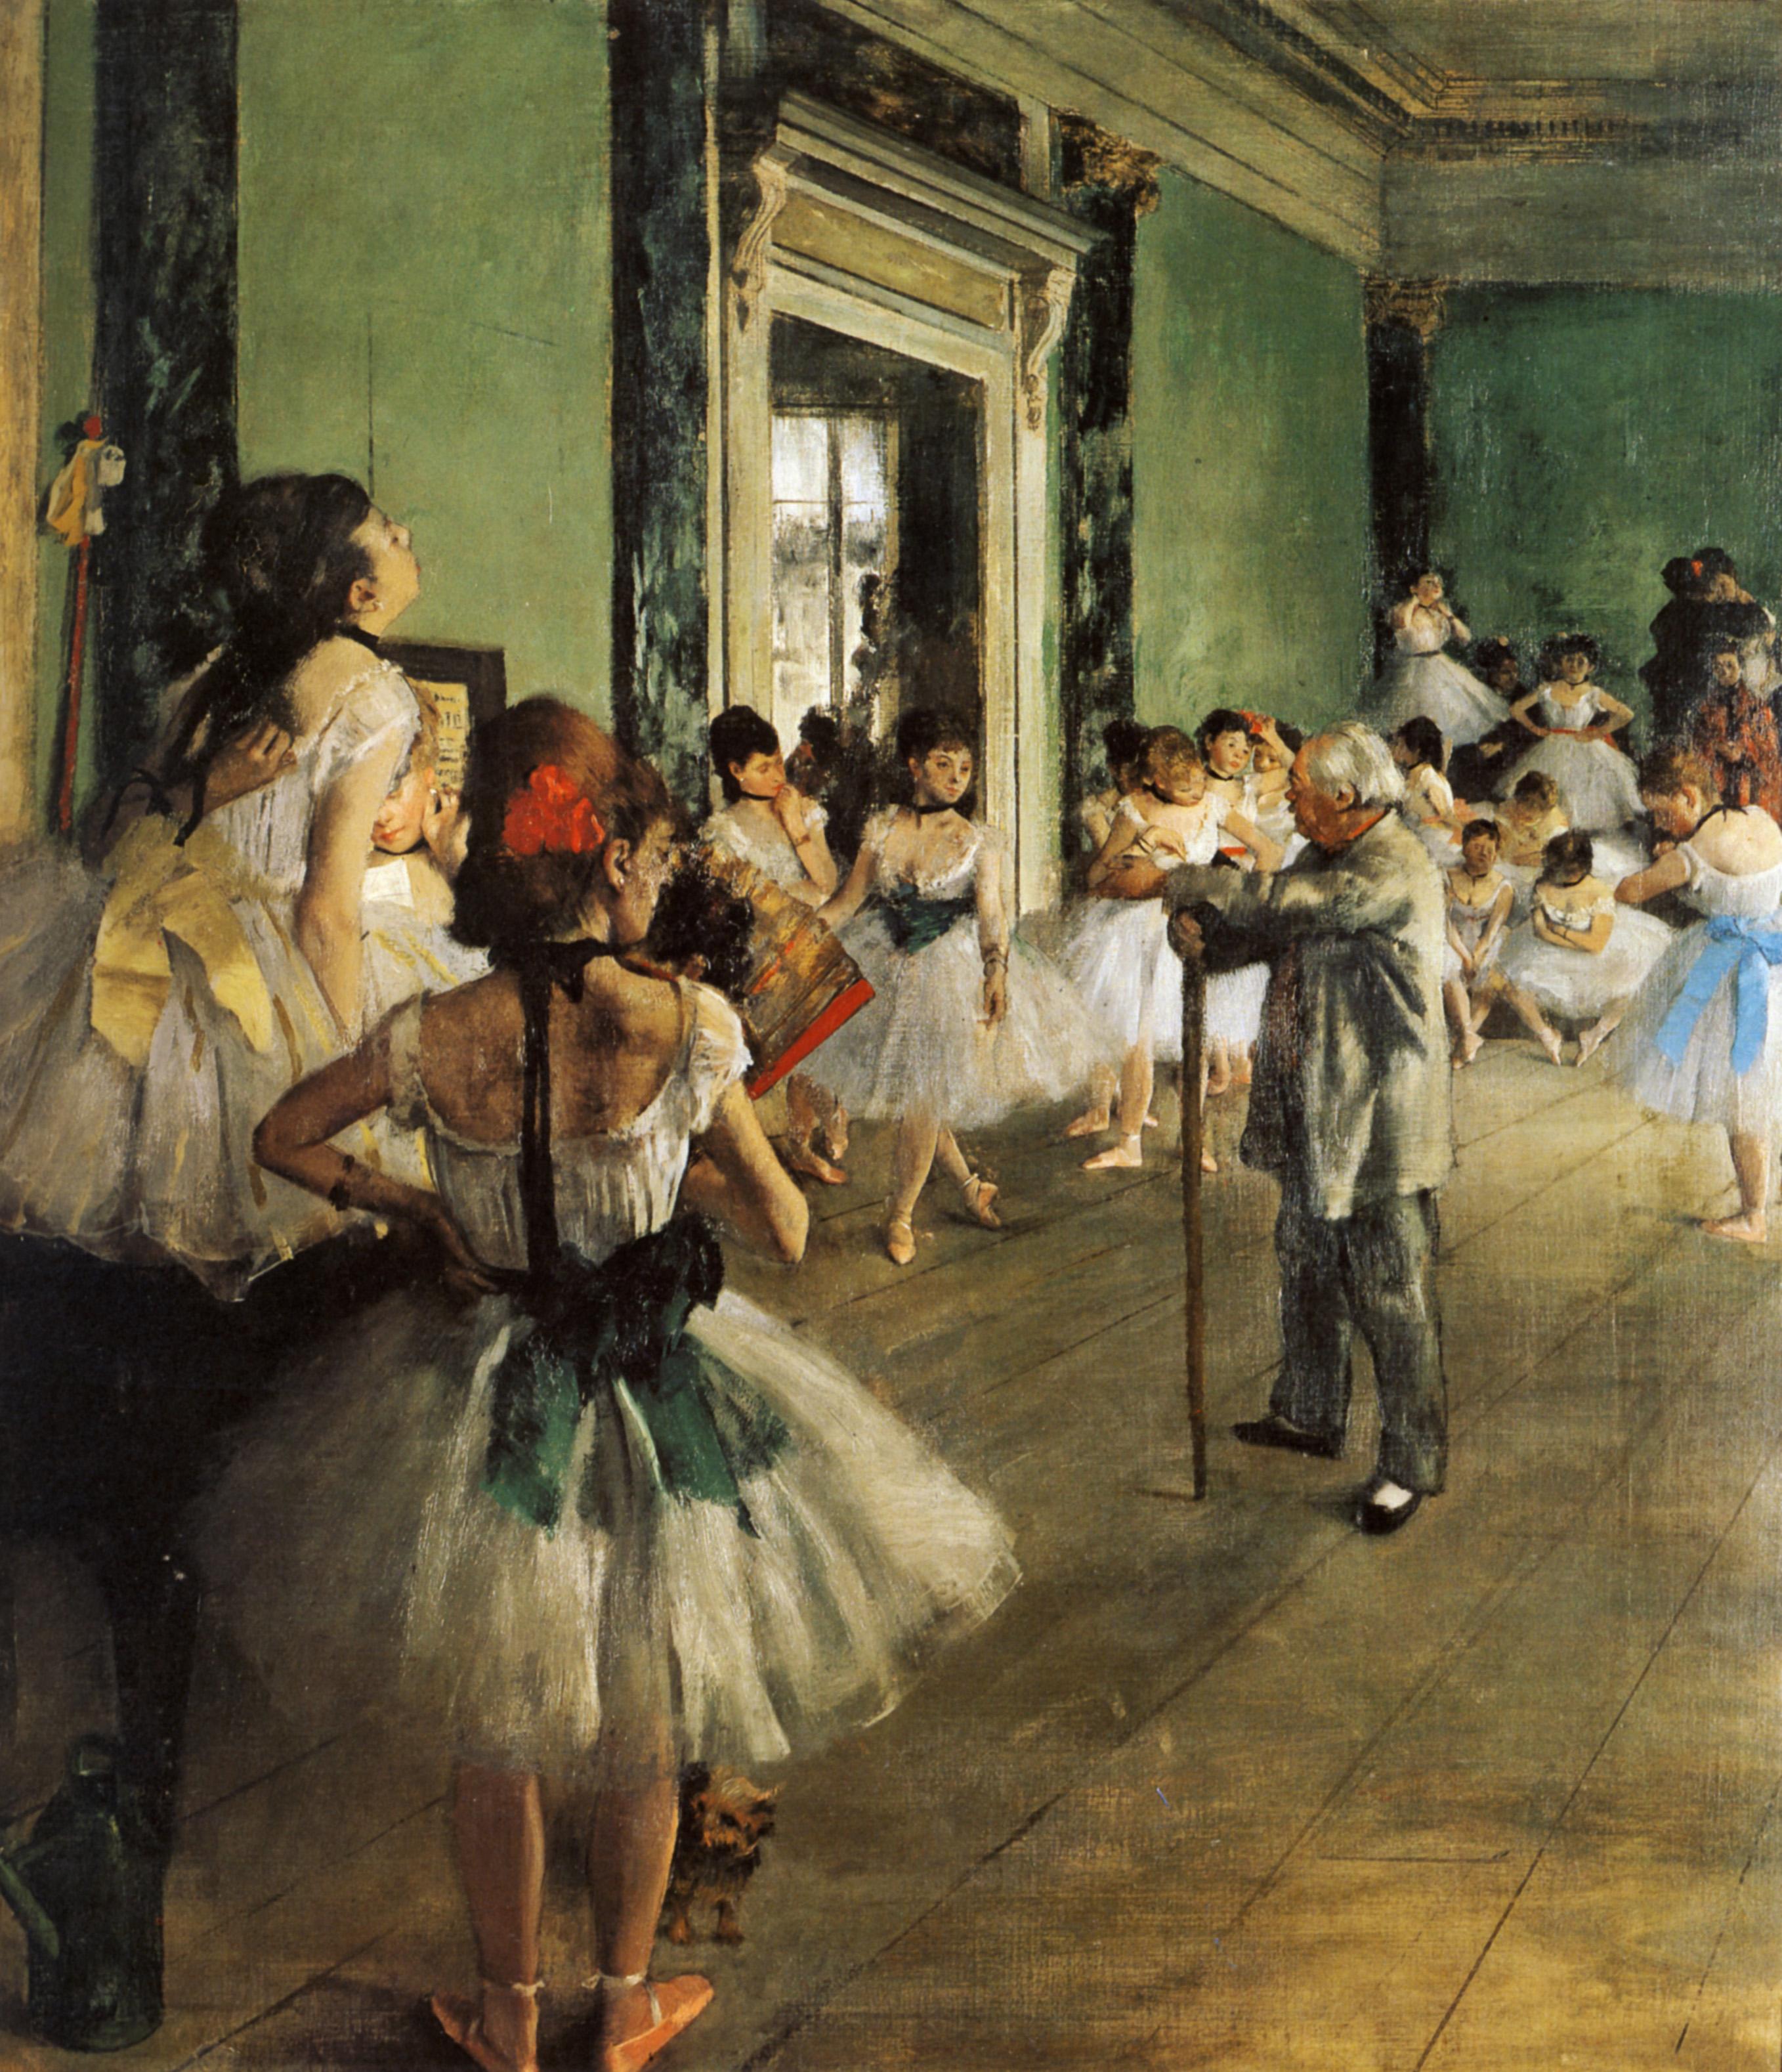 https://i1.wp.com/upload.wikimedia.org/wikipedia/commons/d/d3/Degas-_La_classe_de_danse_1874.jpg